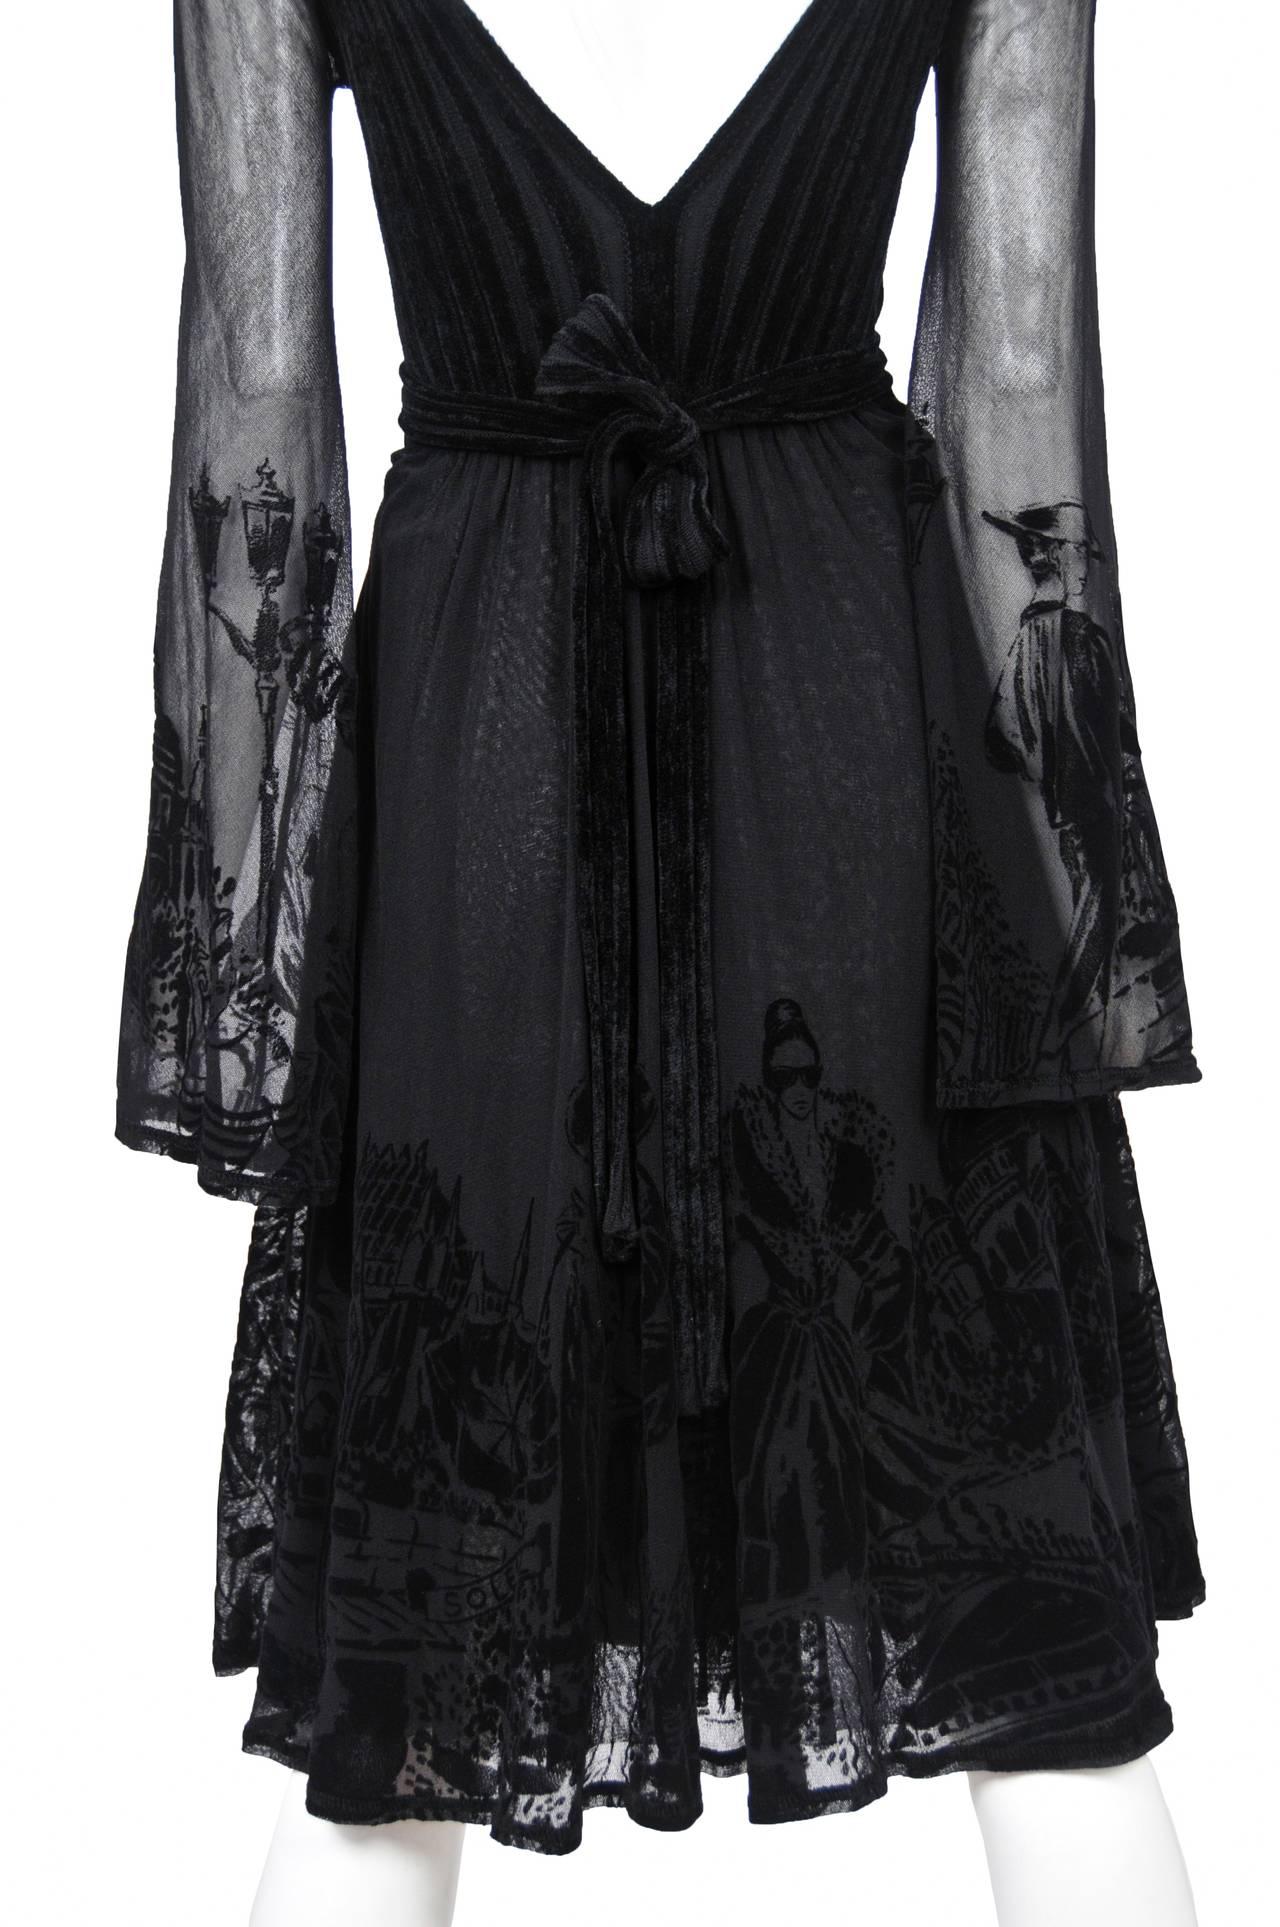 Gaultier Burnout Dress 2